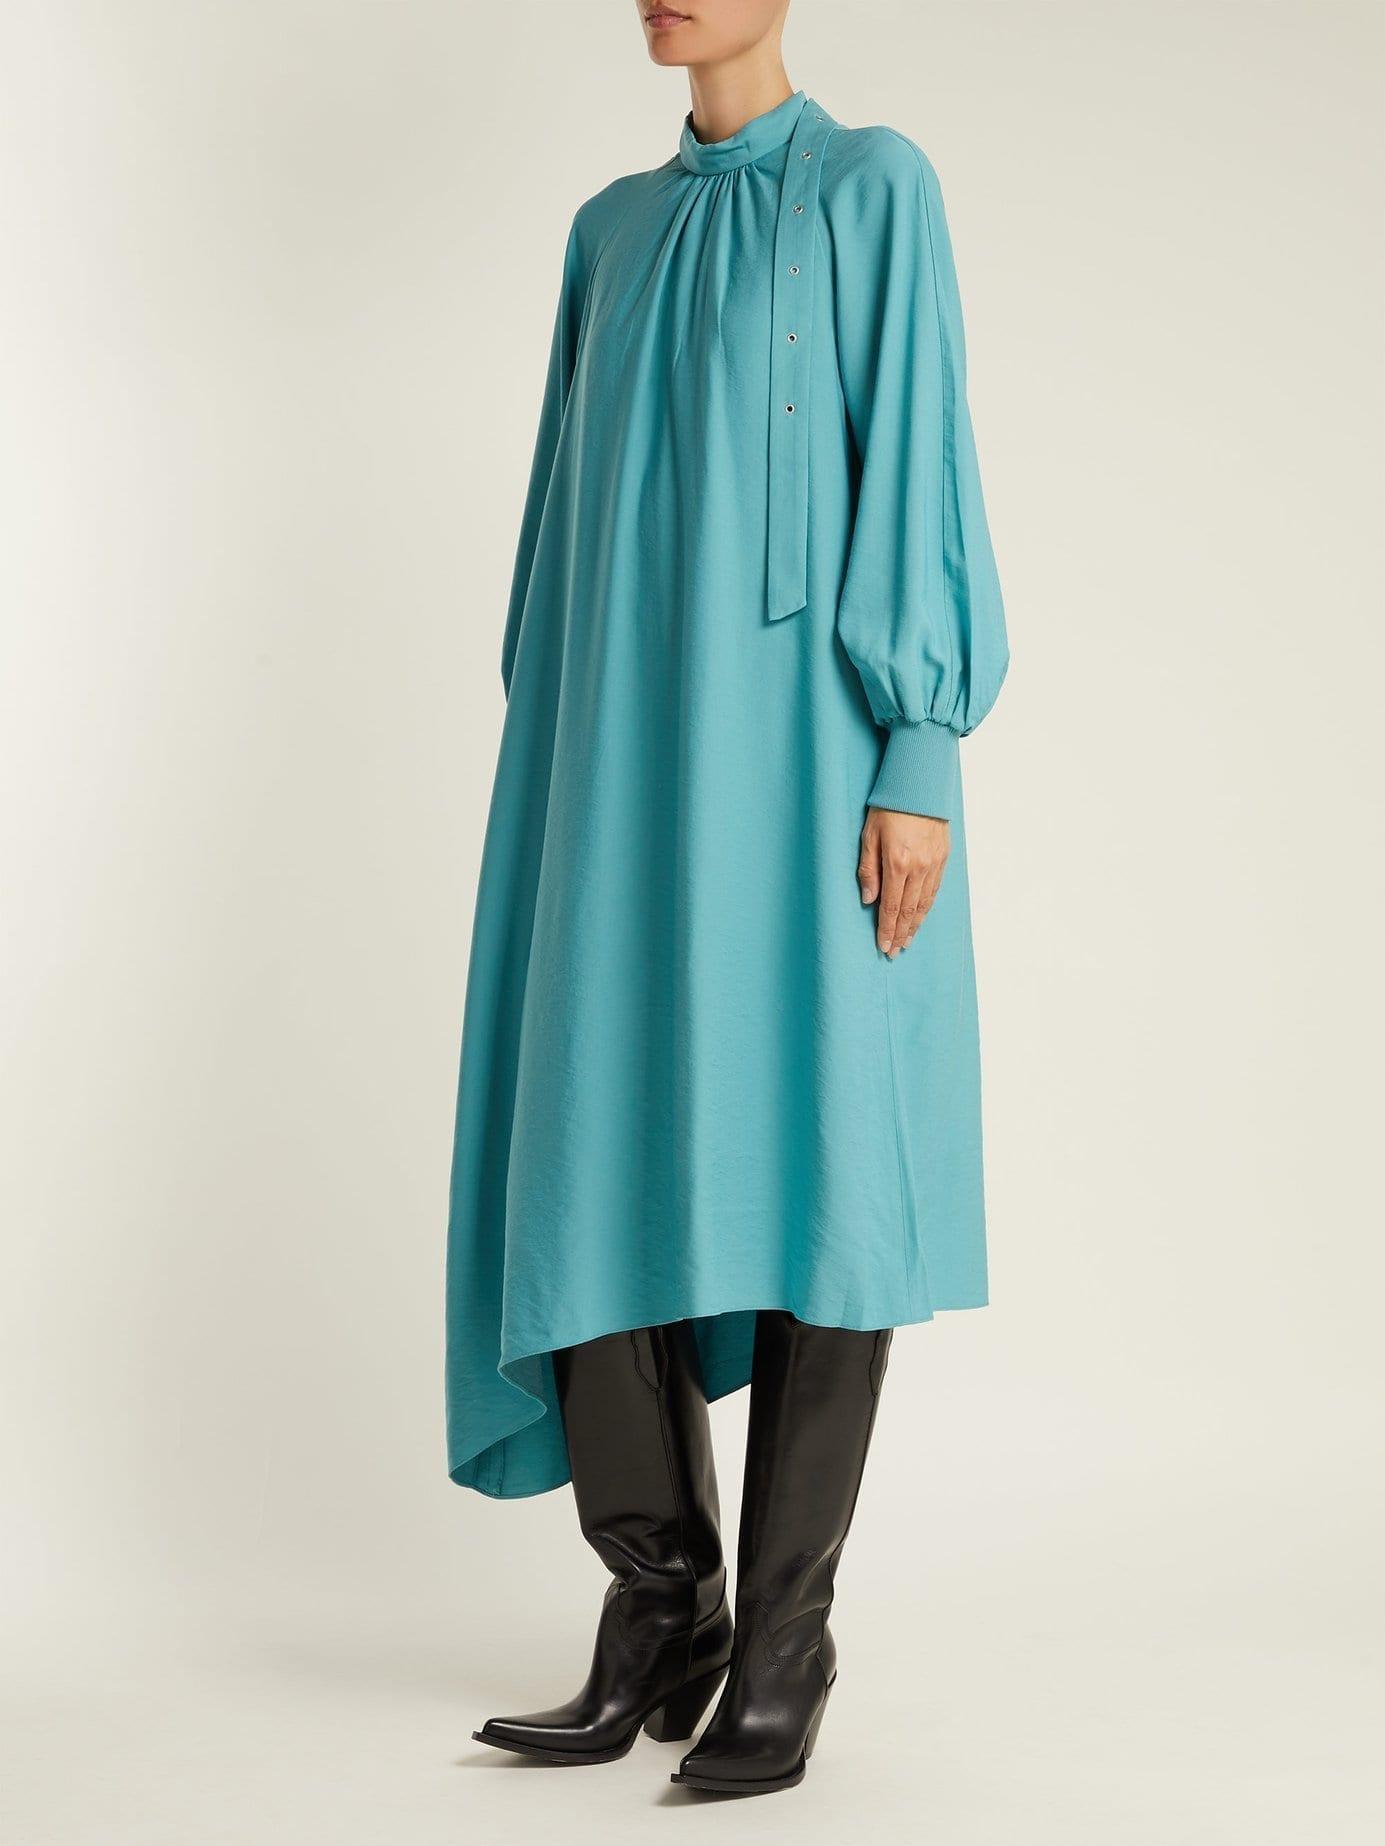 TIBI High Neck Asymmetric Twill Teal Dress